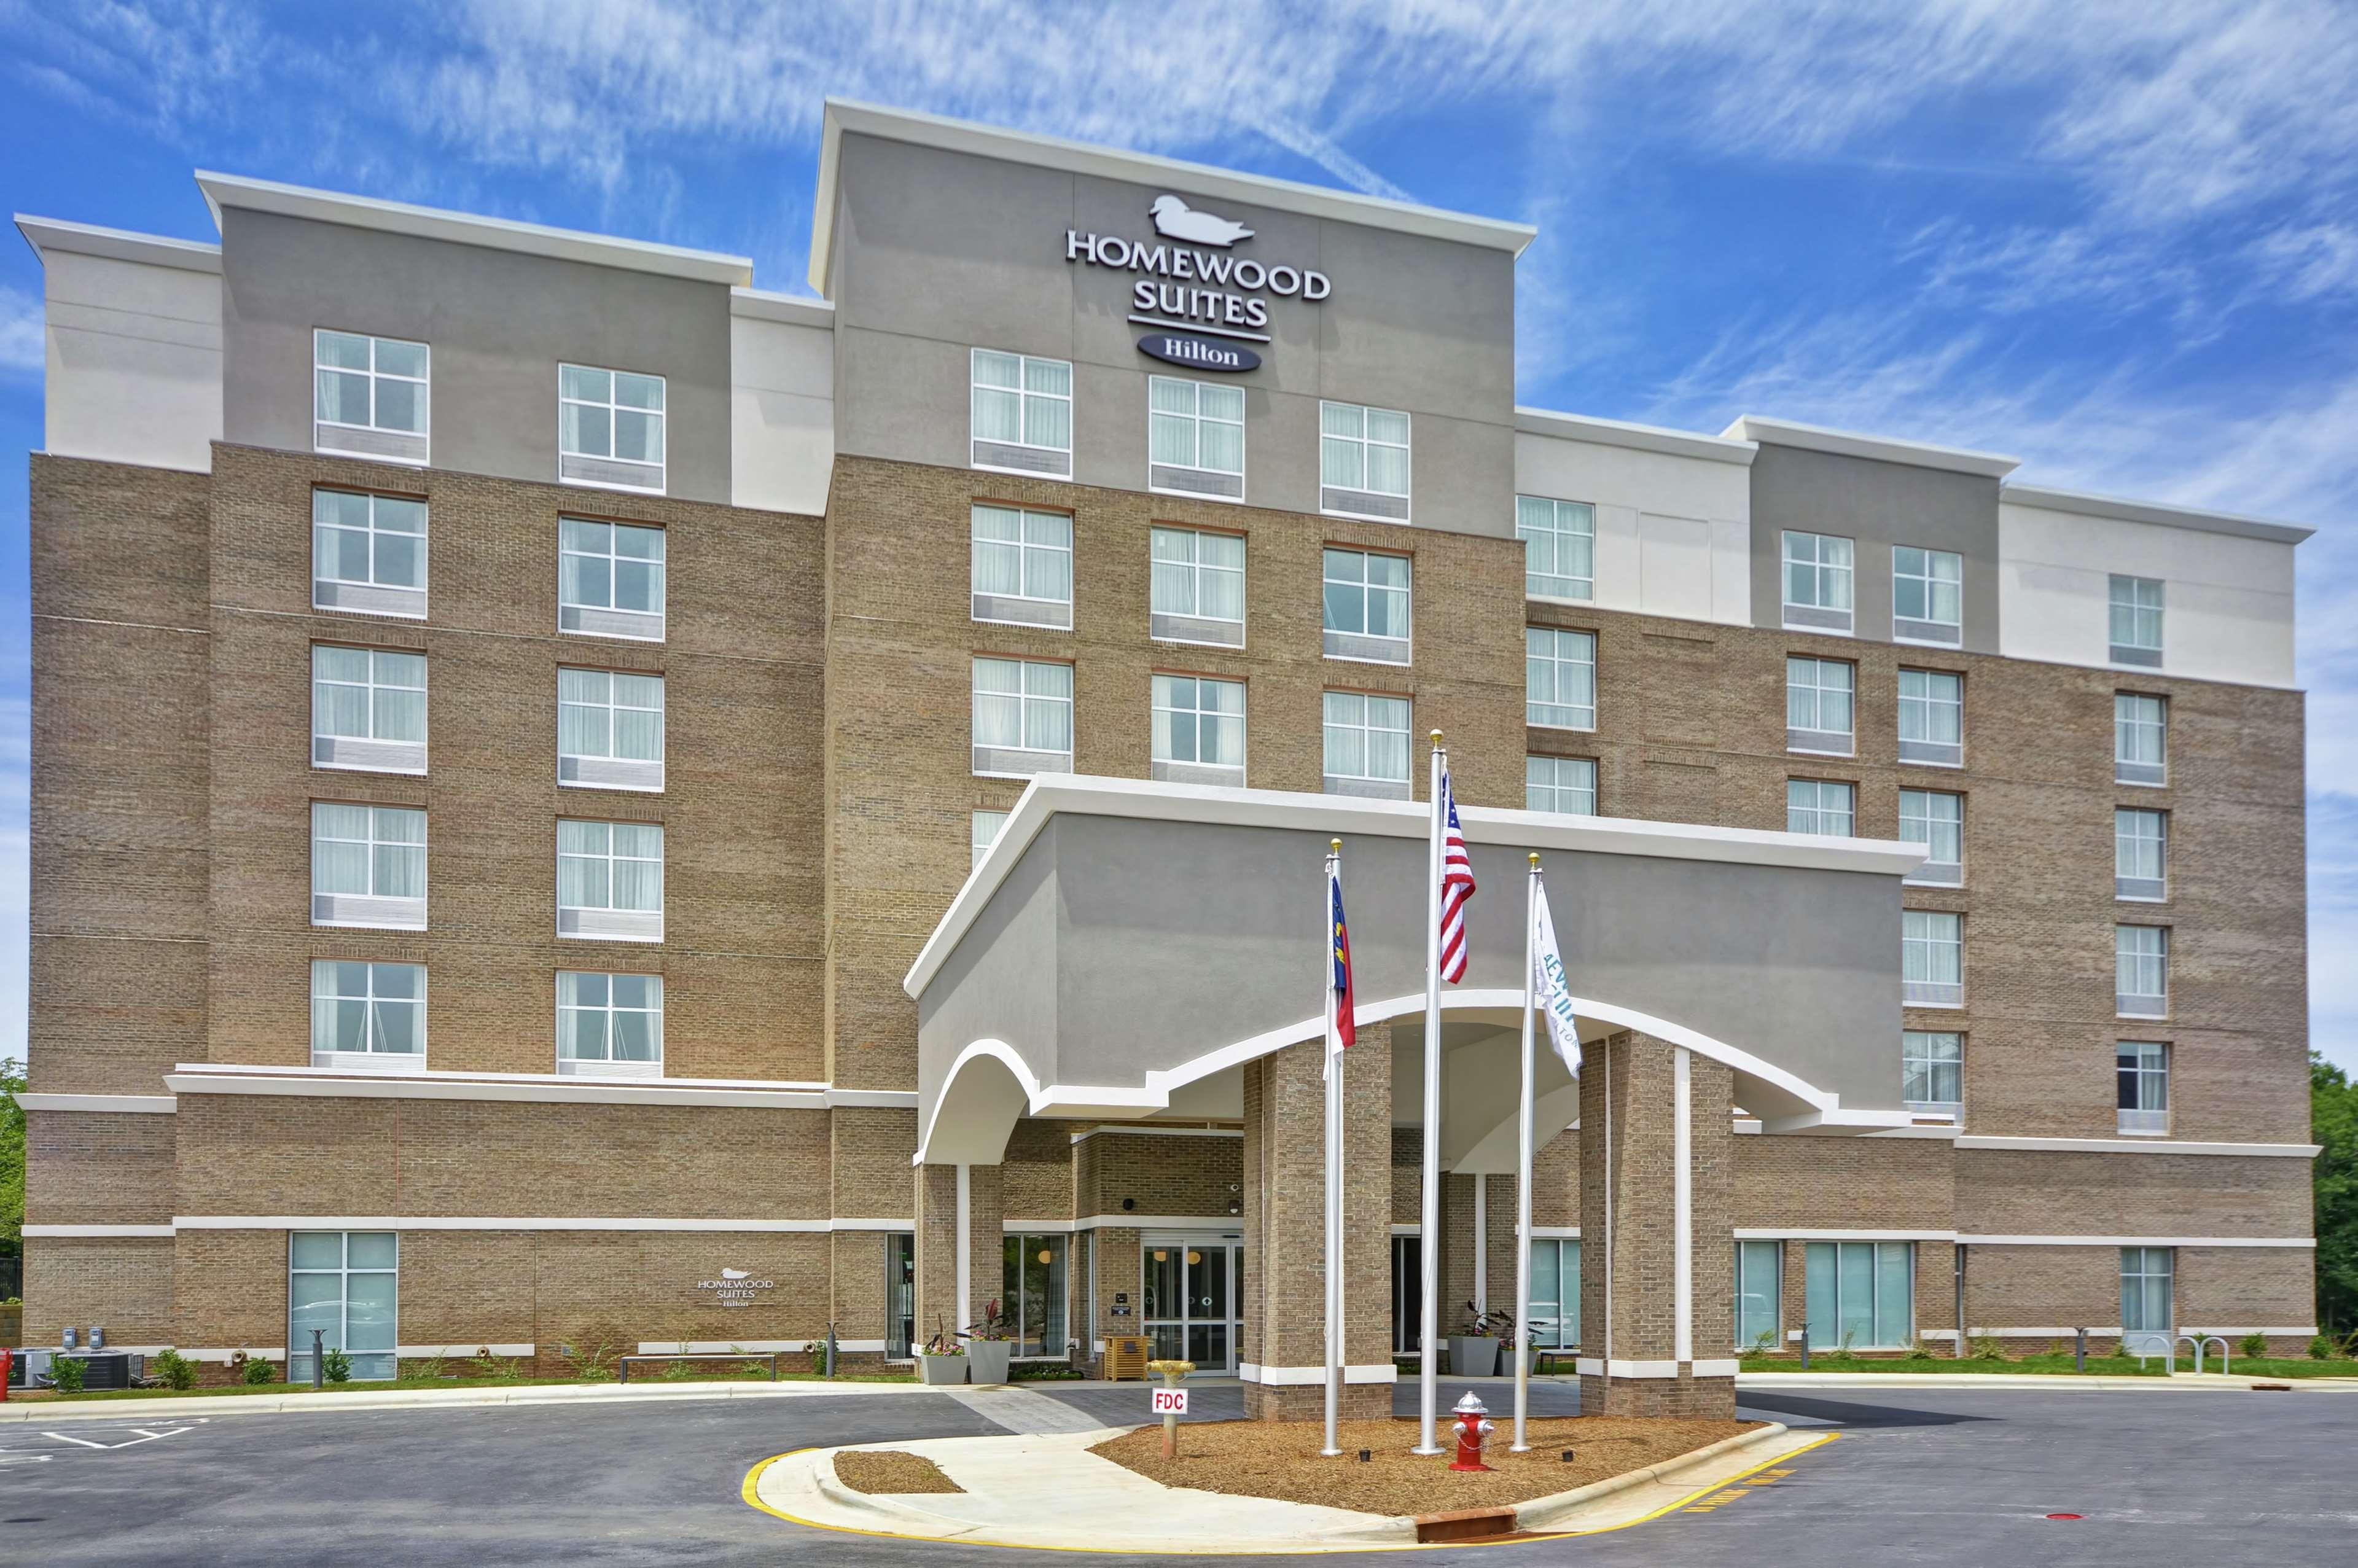 Homewood Suites by Hilton Cary, NC, Wake